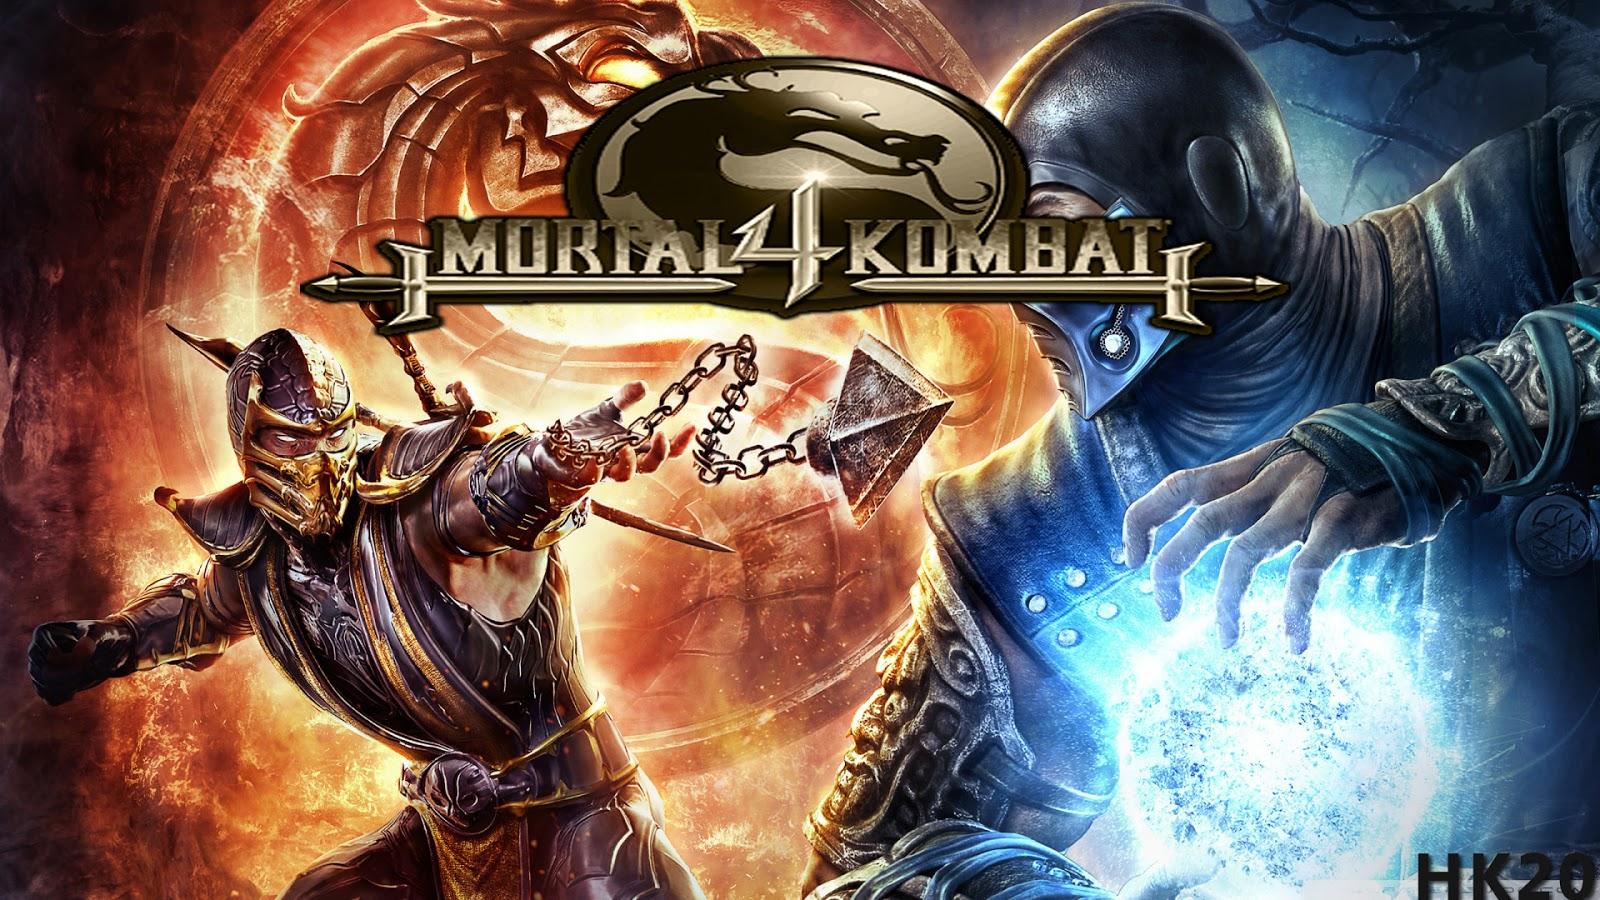 kombat pc mortal compressed 9 download highly